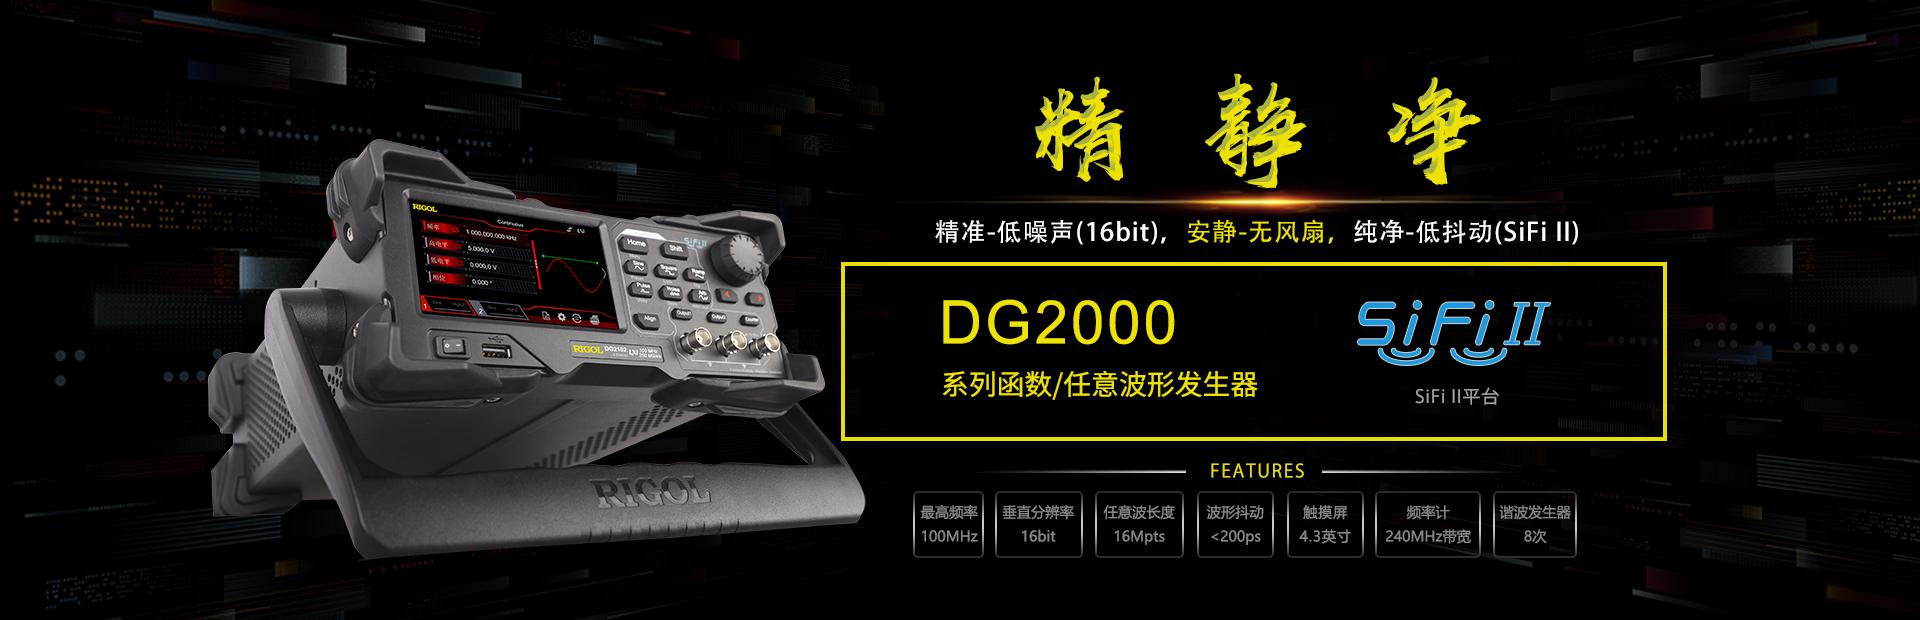 DG2000_1.jpg